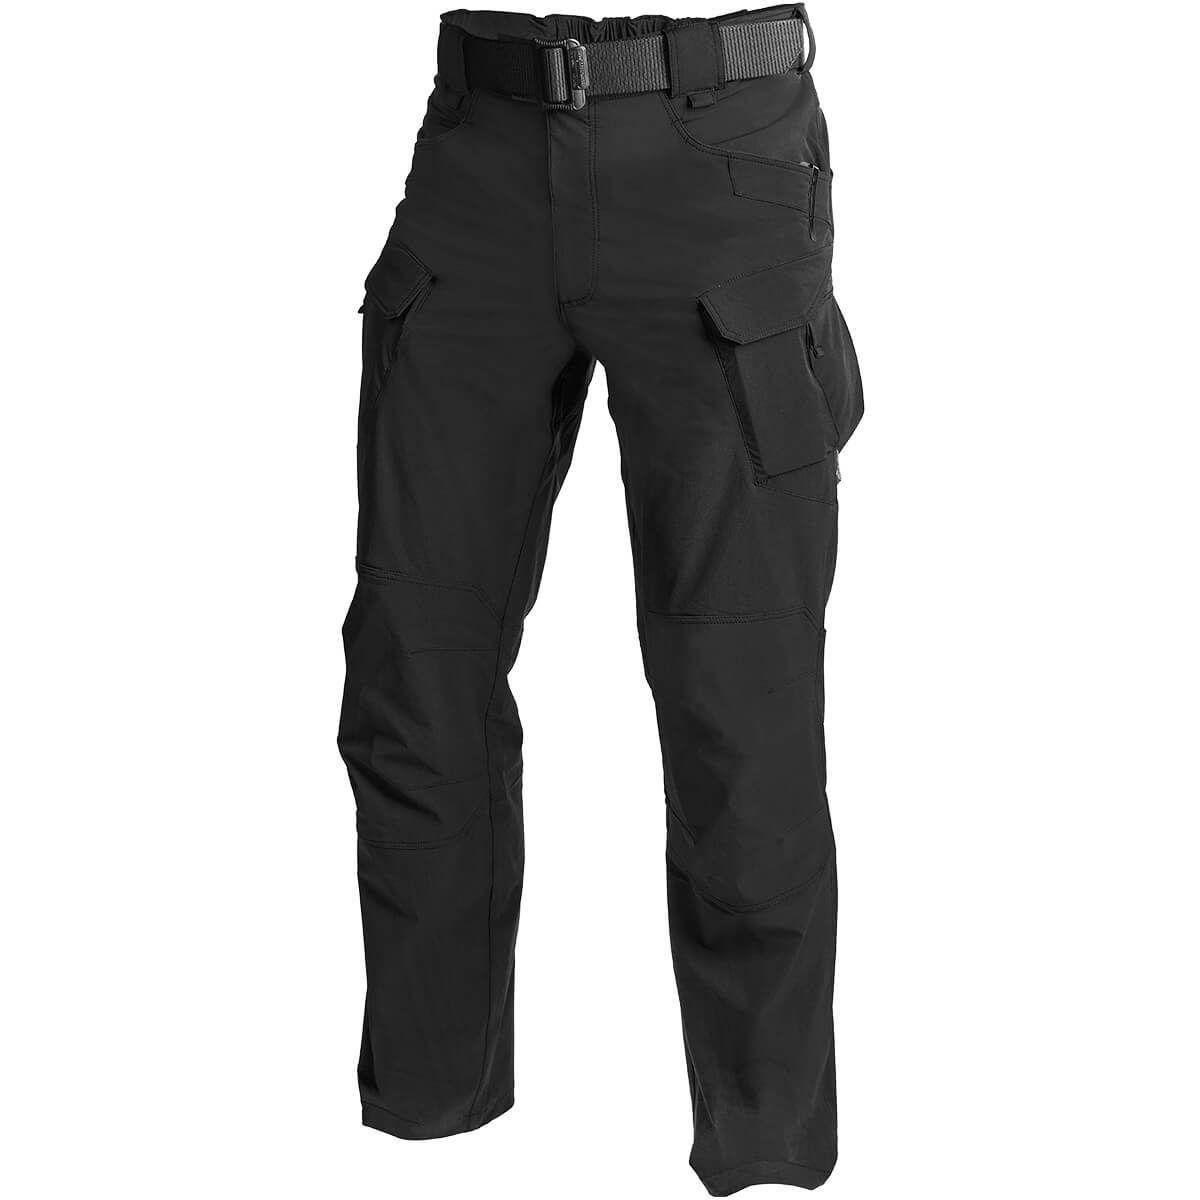 Штаны Helikon OTP Nylon Black Outdoor Tactical Pants (SP-OTP-NL-01) размер XL/regular